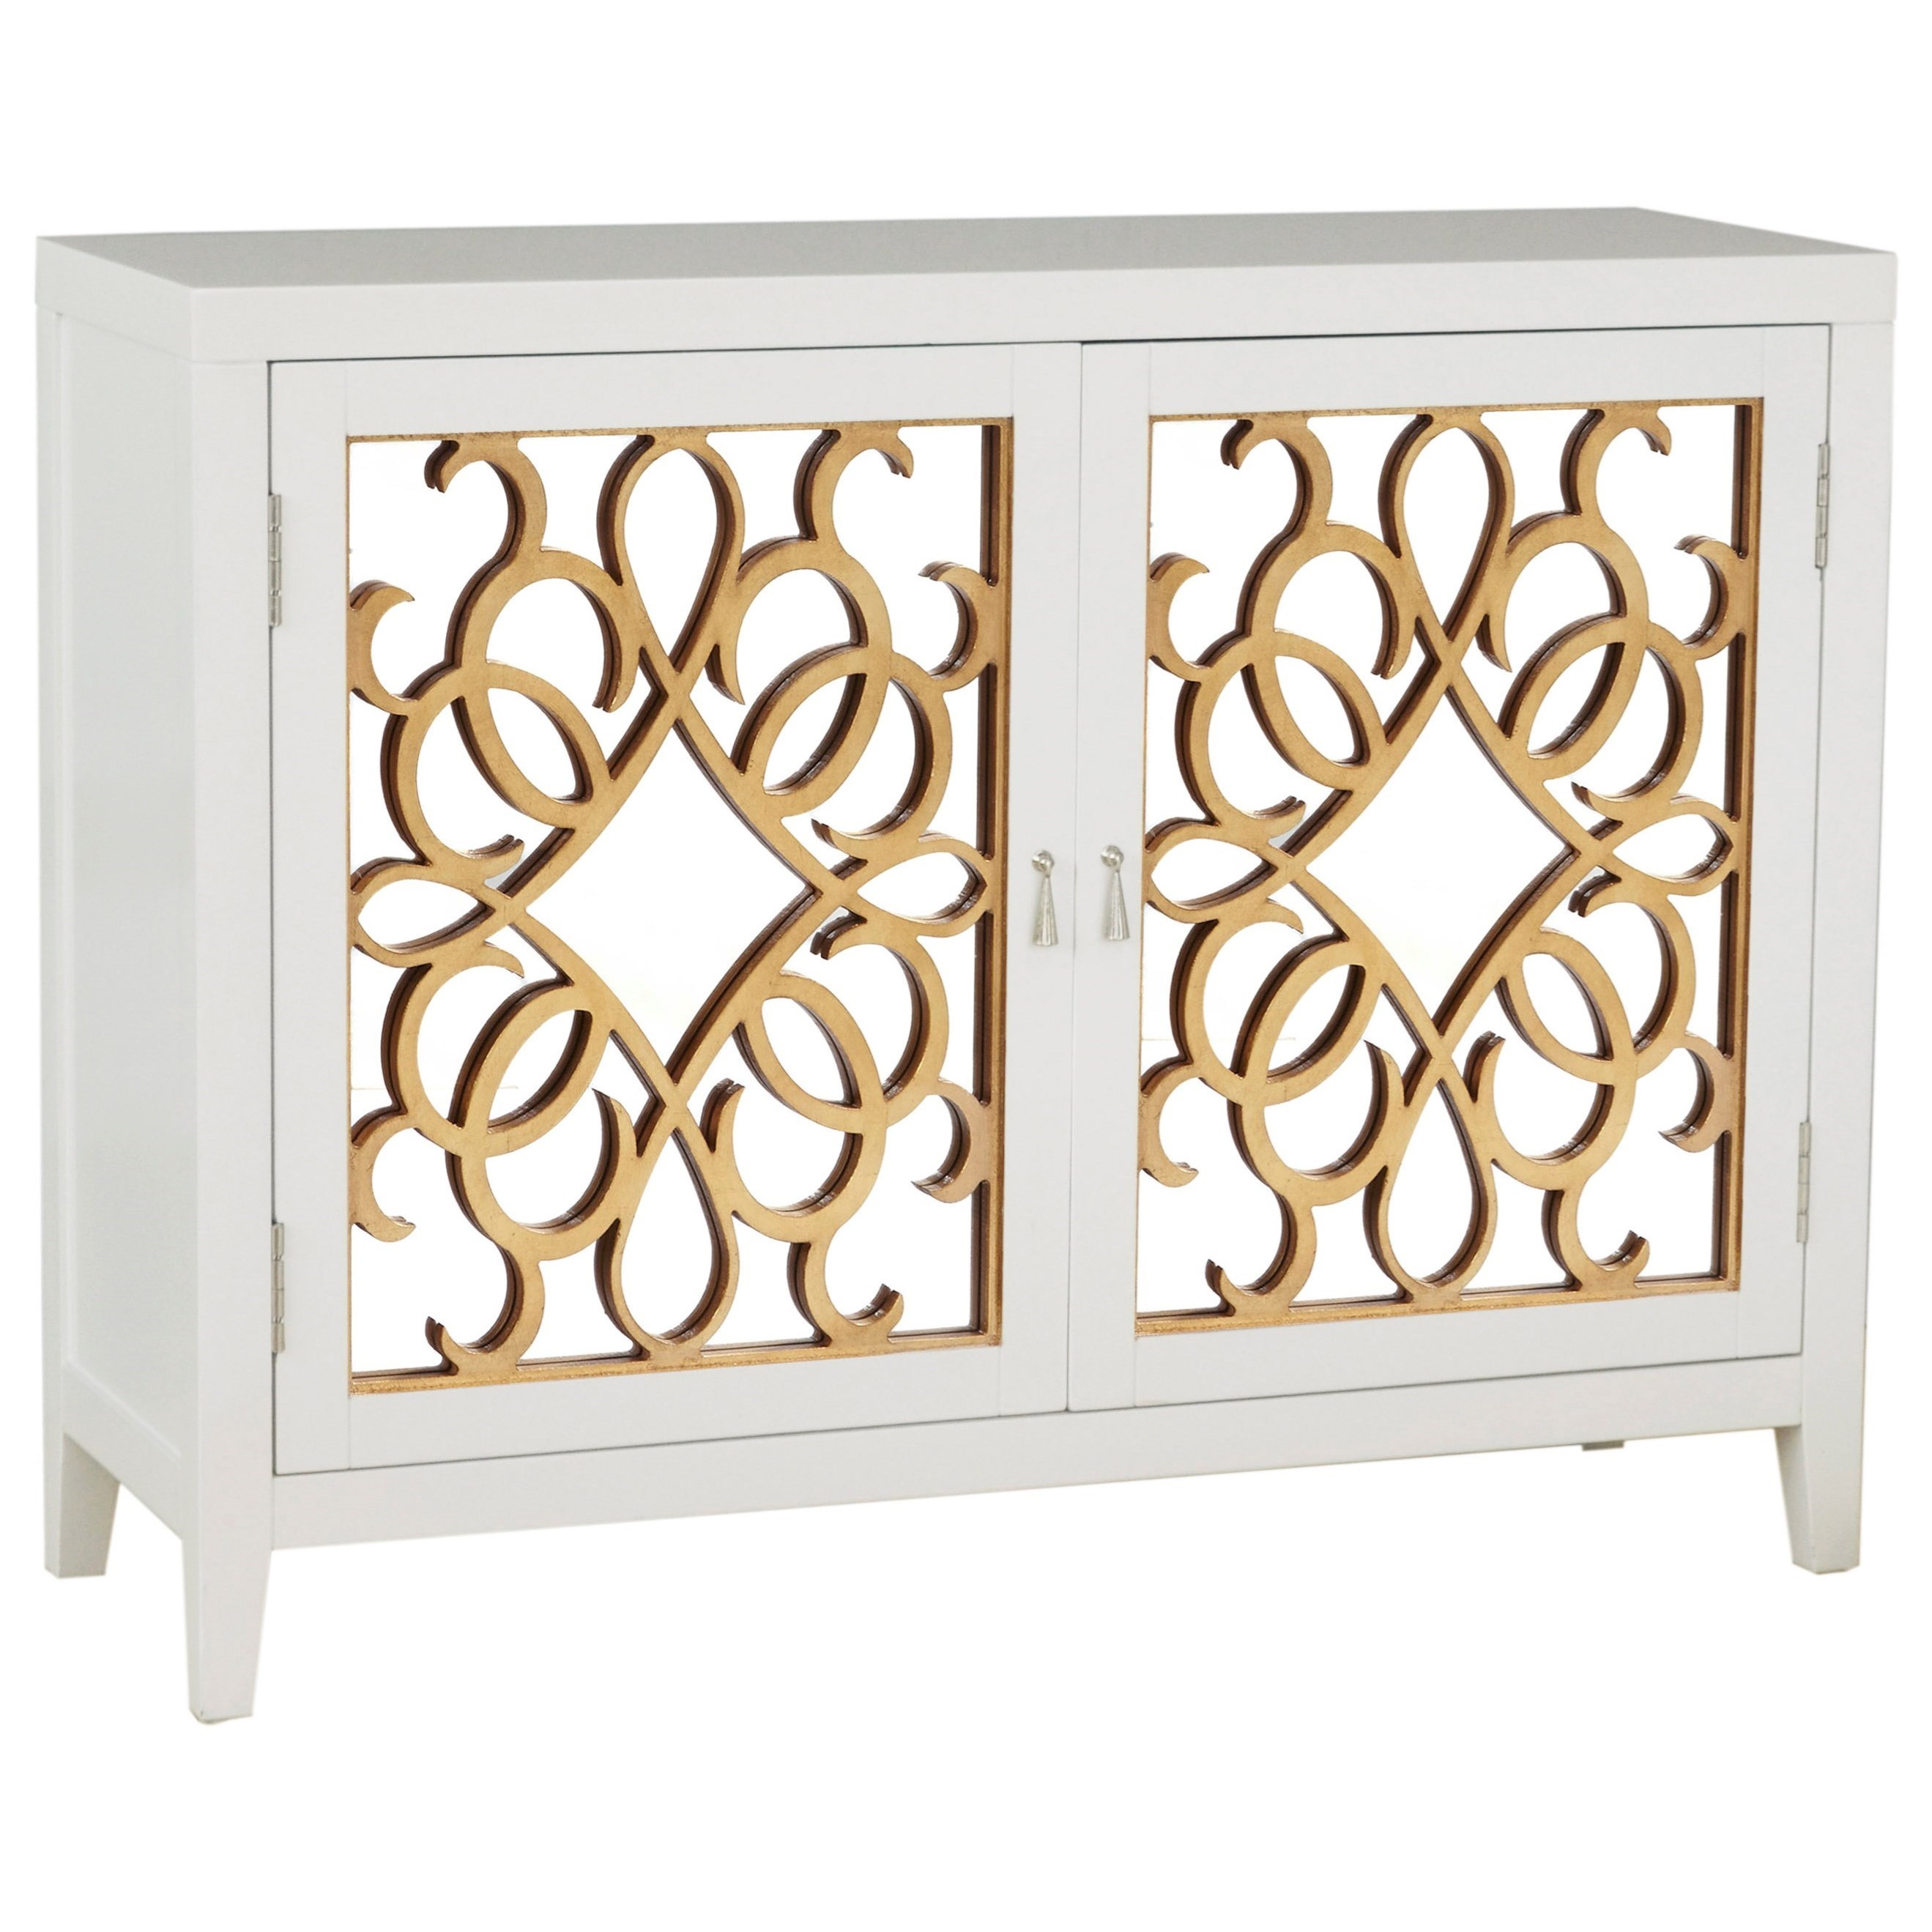 Pulaski Furniture Accents Wine Storage Console - Item Number: 806023